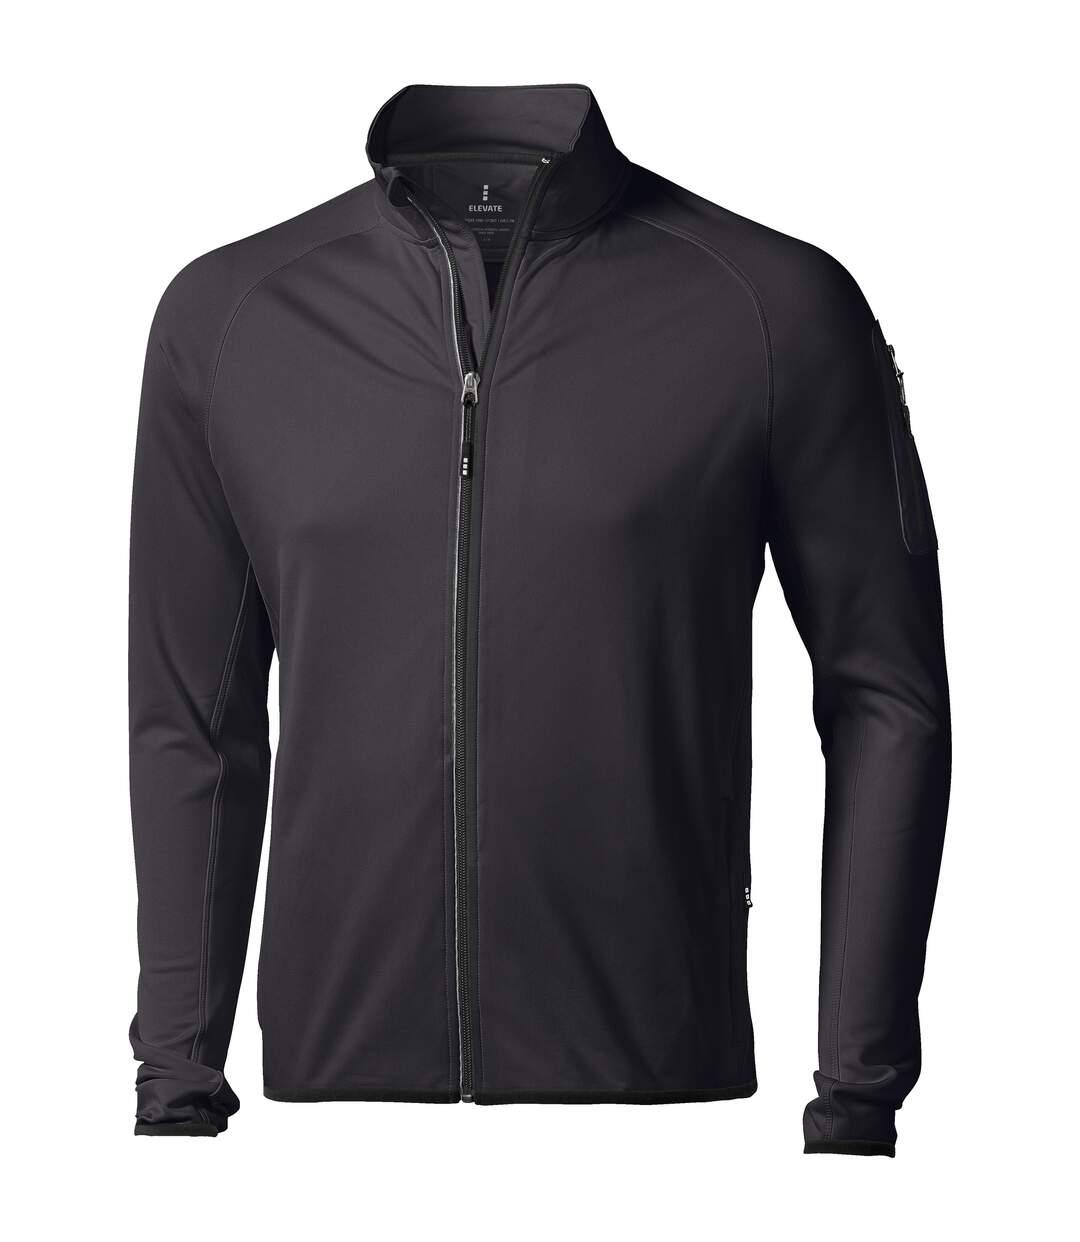 Elevate Mens Mani Power Fleece Full Zip Jacket (Solid Black) - UTPF1942